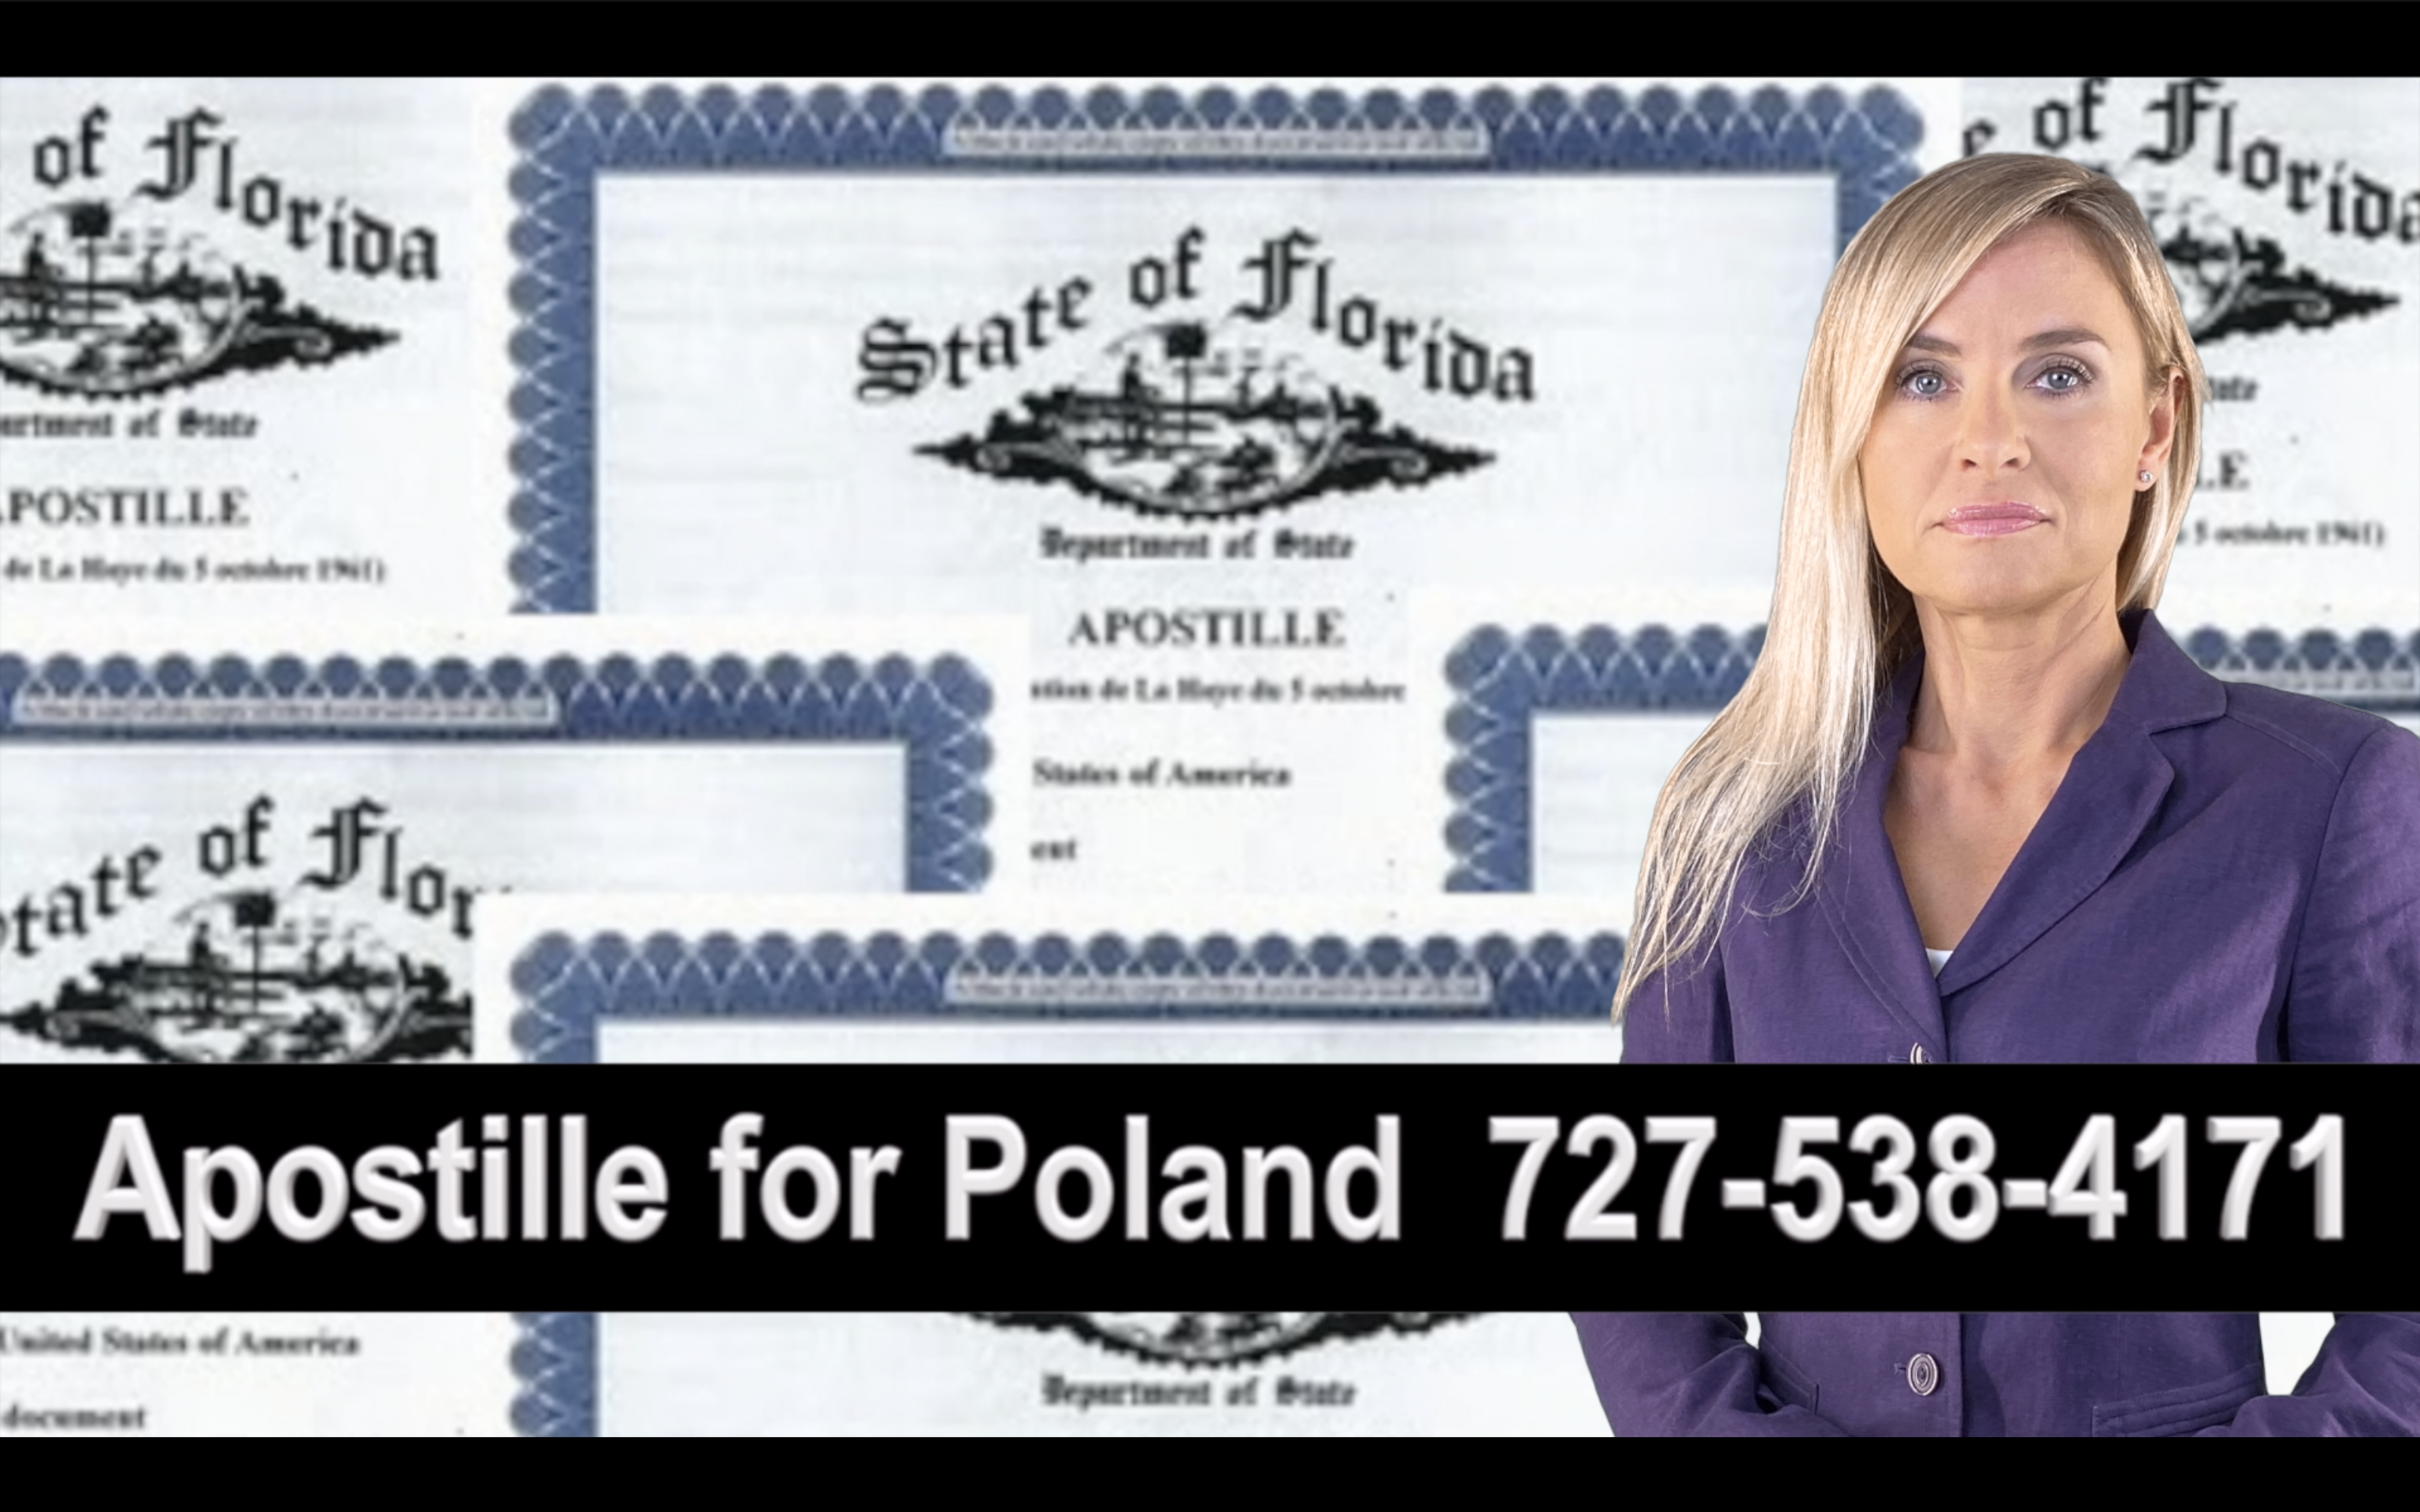 Port Richey Apostille, Notary, Polish, Polski, Notariusz, Pełnomocnictwo, Power of Attorney, Agnieszka Piasecka, Aga Piasecka